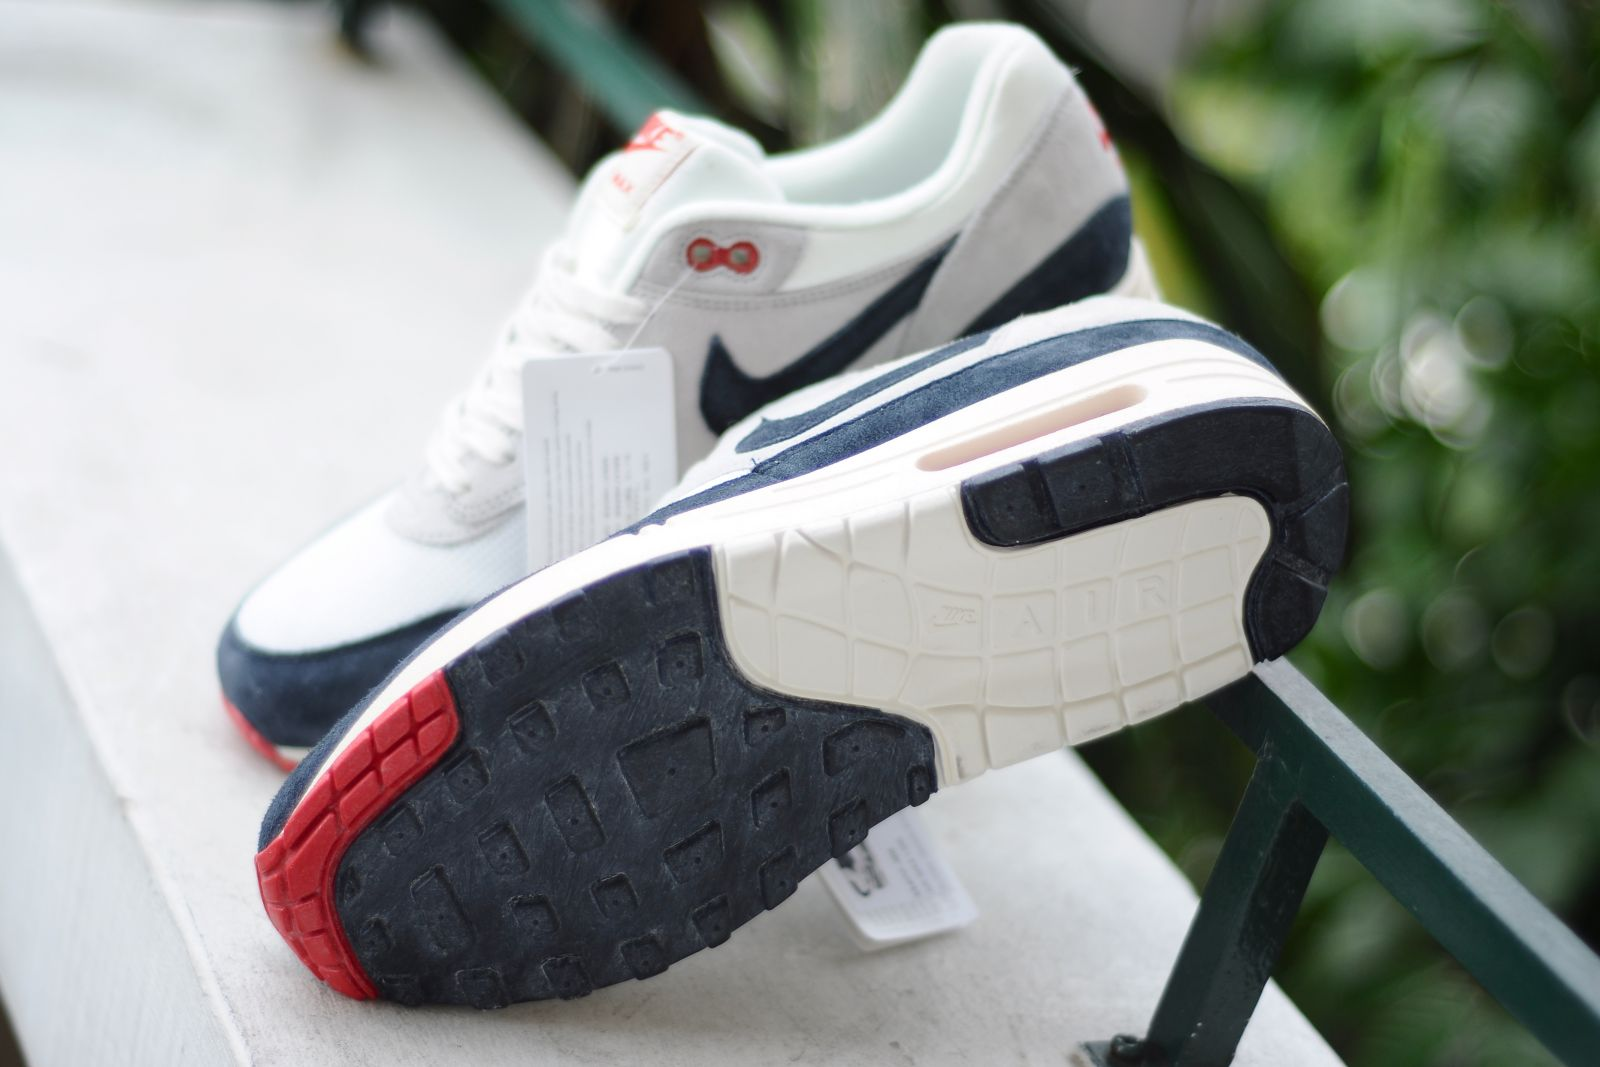 Nike Air Max 1 OG VNTG - White Navy-Red  fdf6e219a6a0